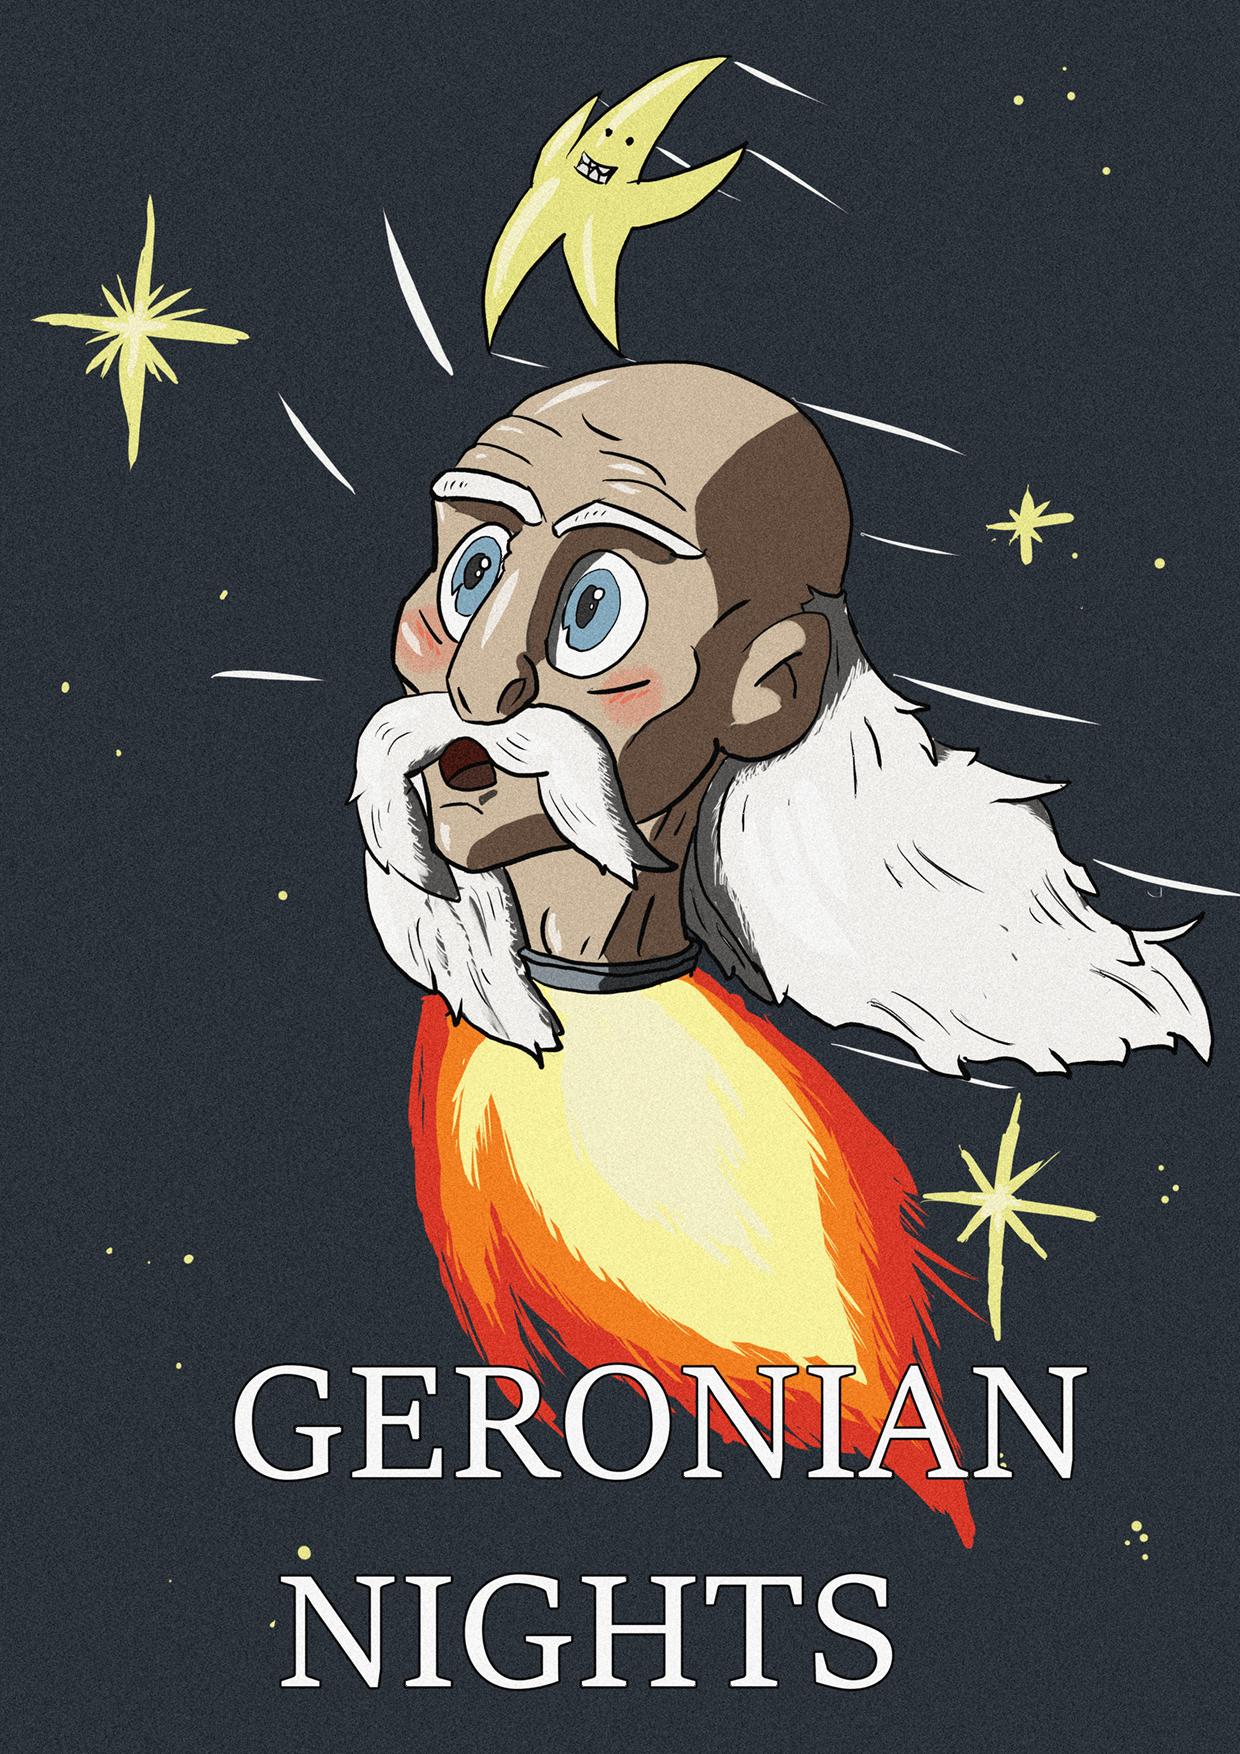 Geronian Nights